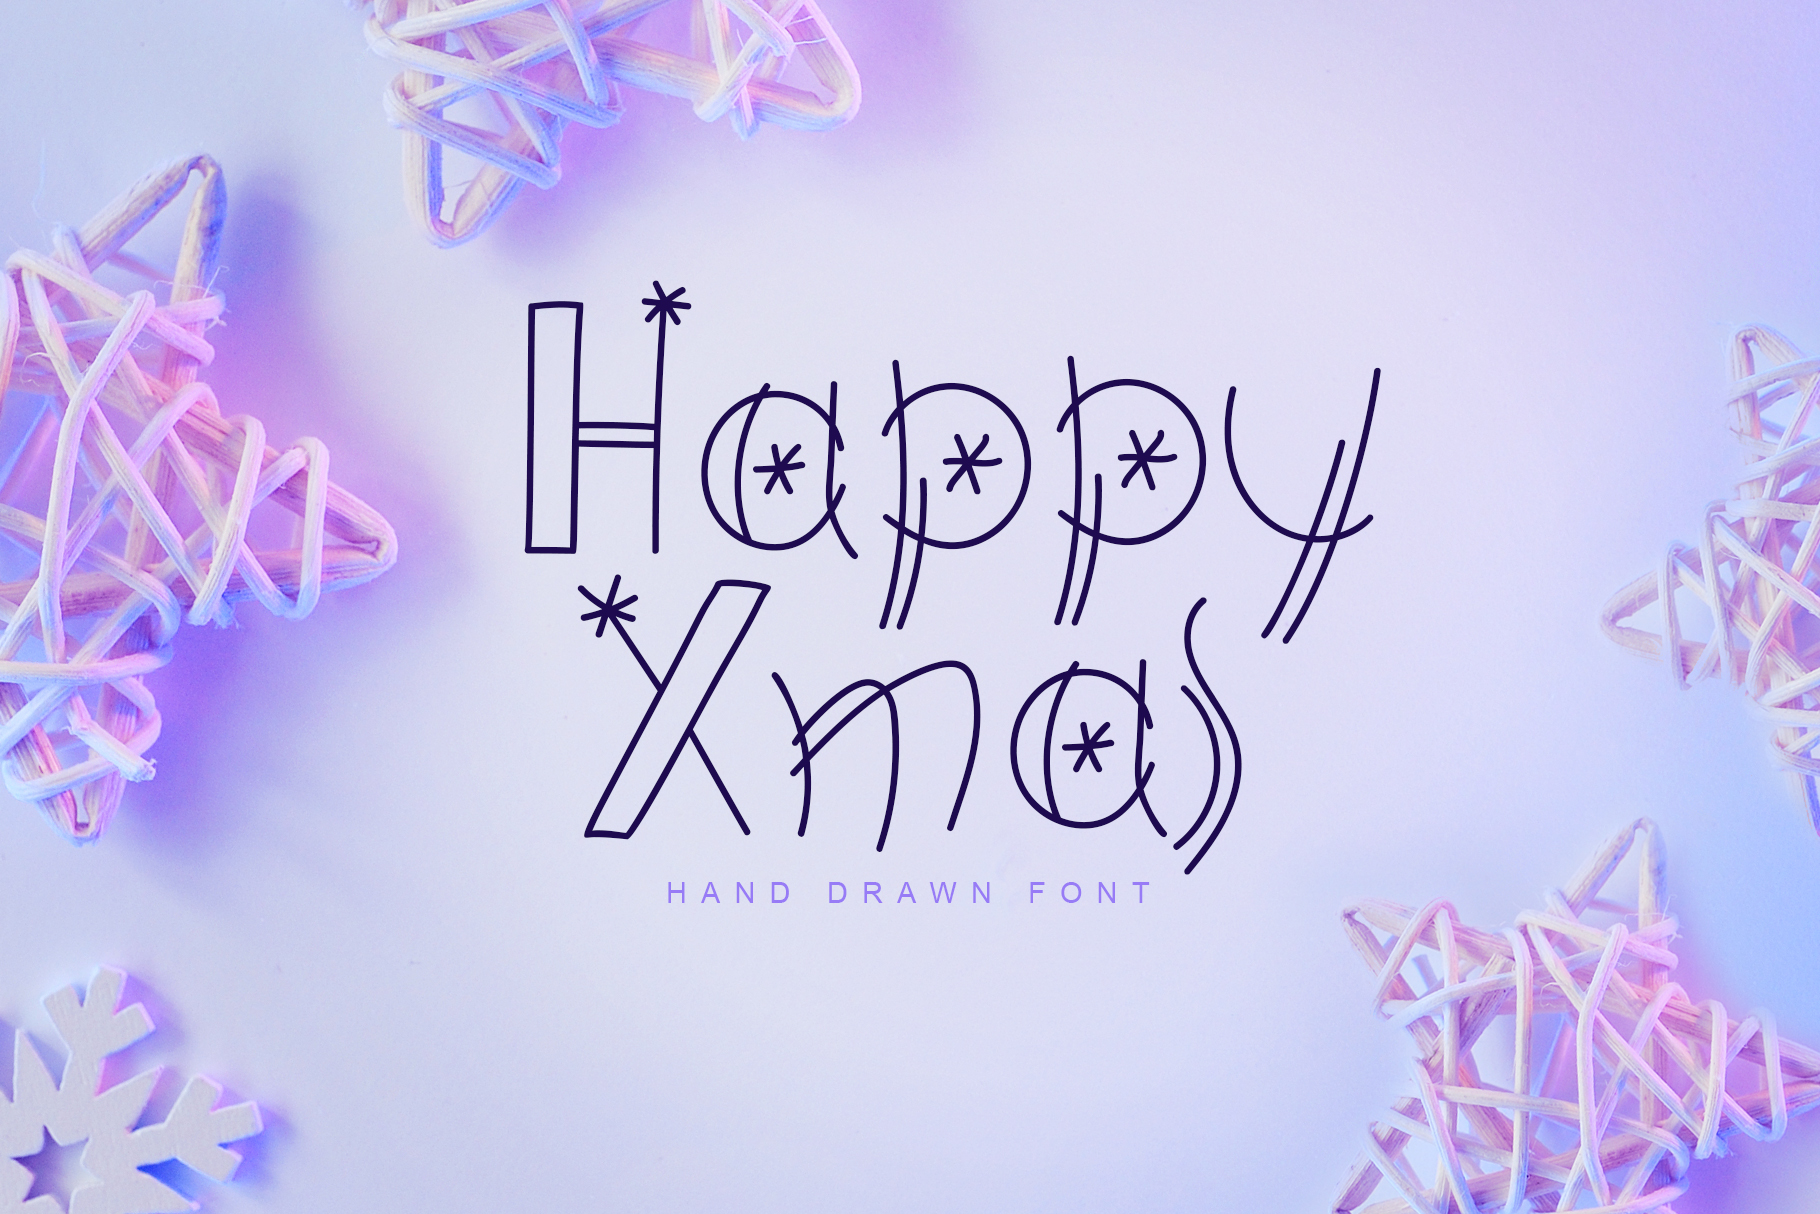 Happy Xmas Hand Drawn Font example image 1